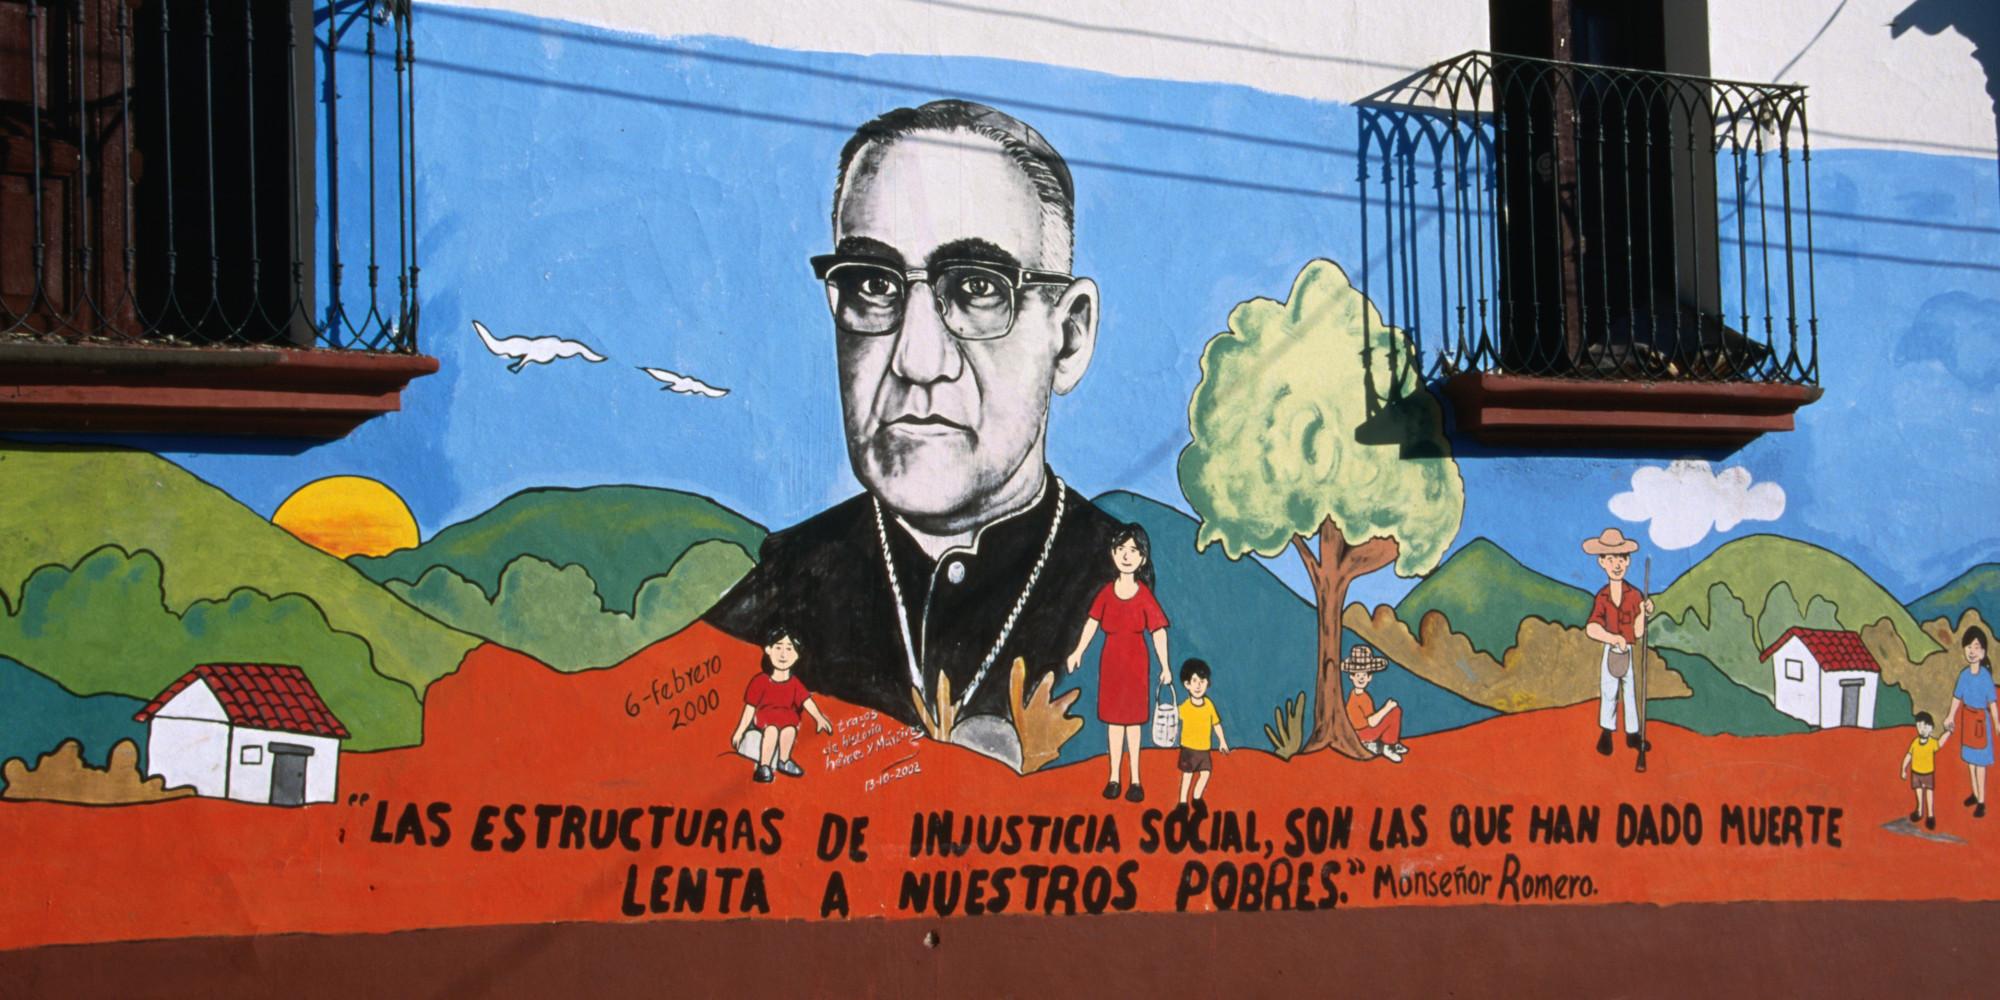 Blessed Oscar Romero also Catholic Meida Archbishop Romero Martyr To Be Beatified May 23 besides Romero as well Cnnee Spec Romero Beatification Guerrilla Radio Carlos Henriquez further C3 93scar Romero. on oscar romero beatification